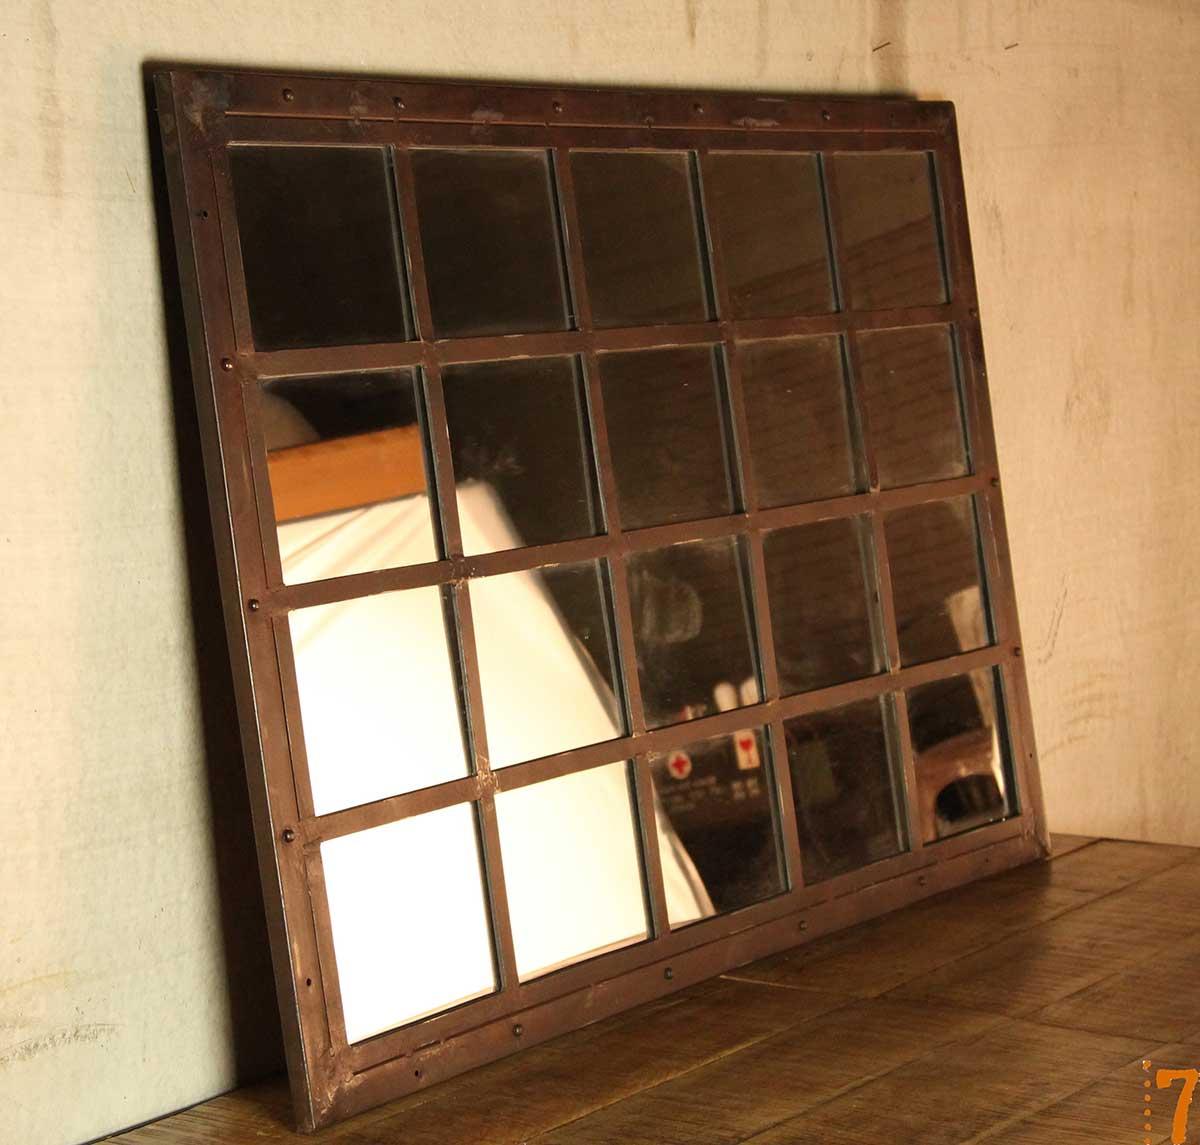 Miroir esprit atelier for Miroir atelier